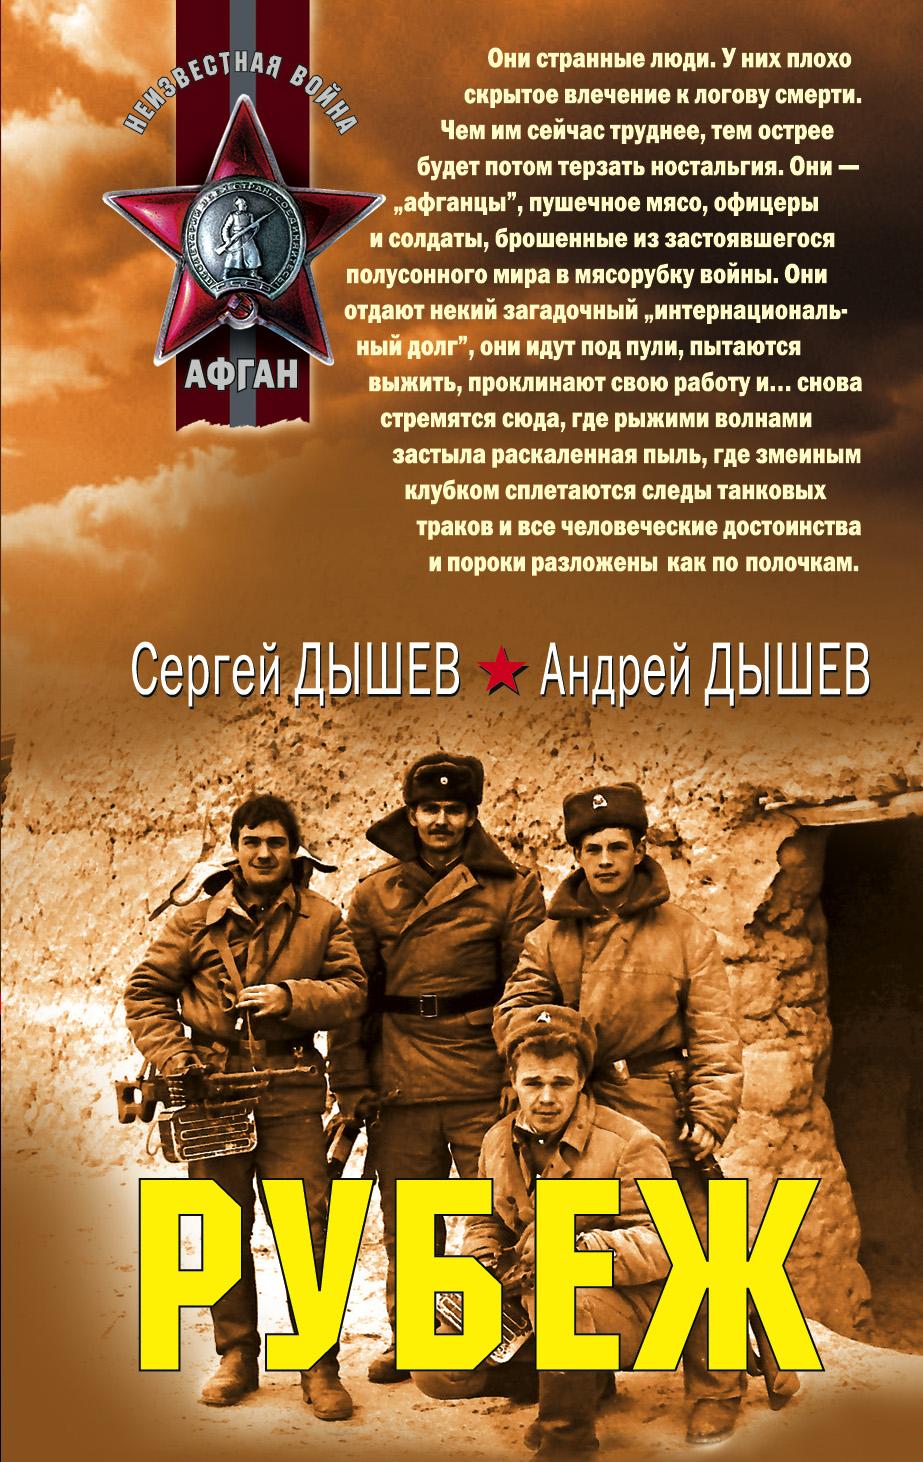 цена на Андрей Дышев Рубеж (сборник)